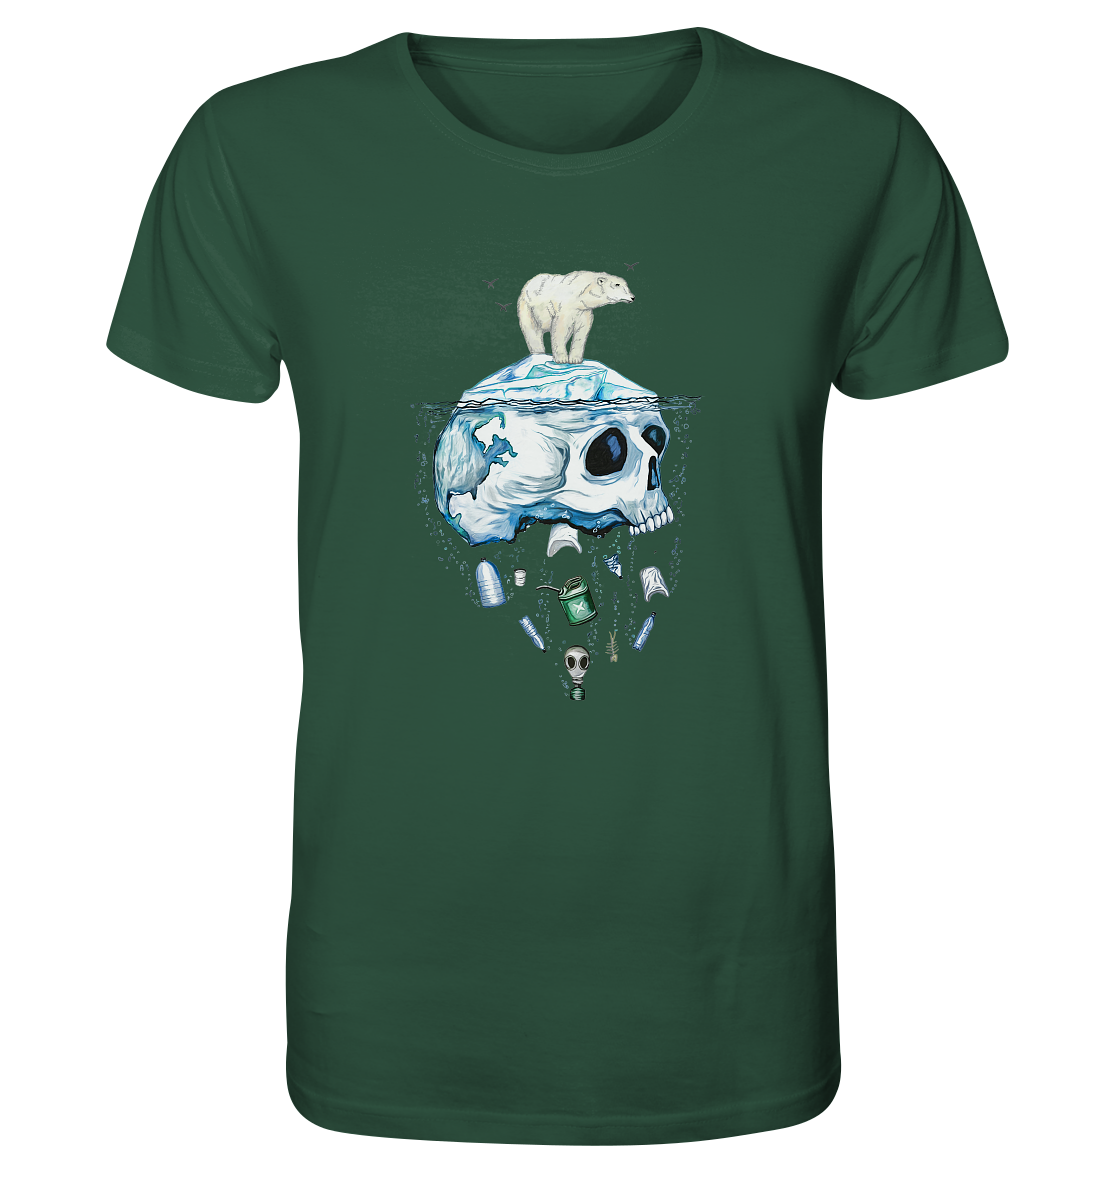 front-organic-shirt-2f5240-1116x.png